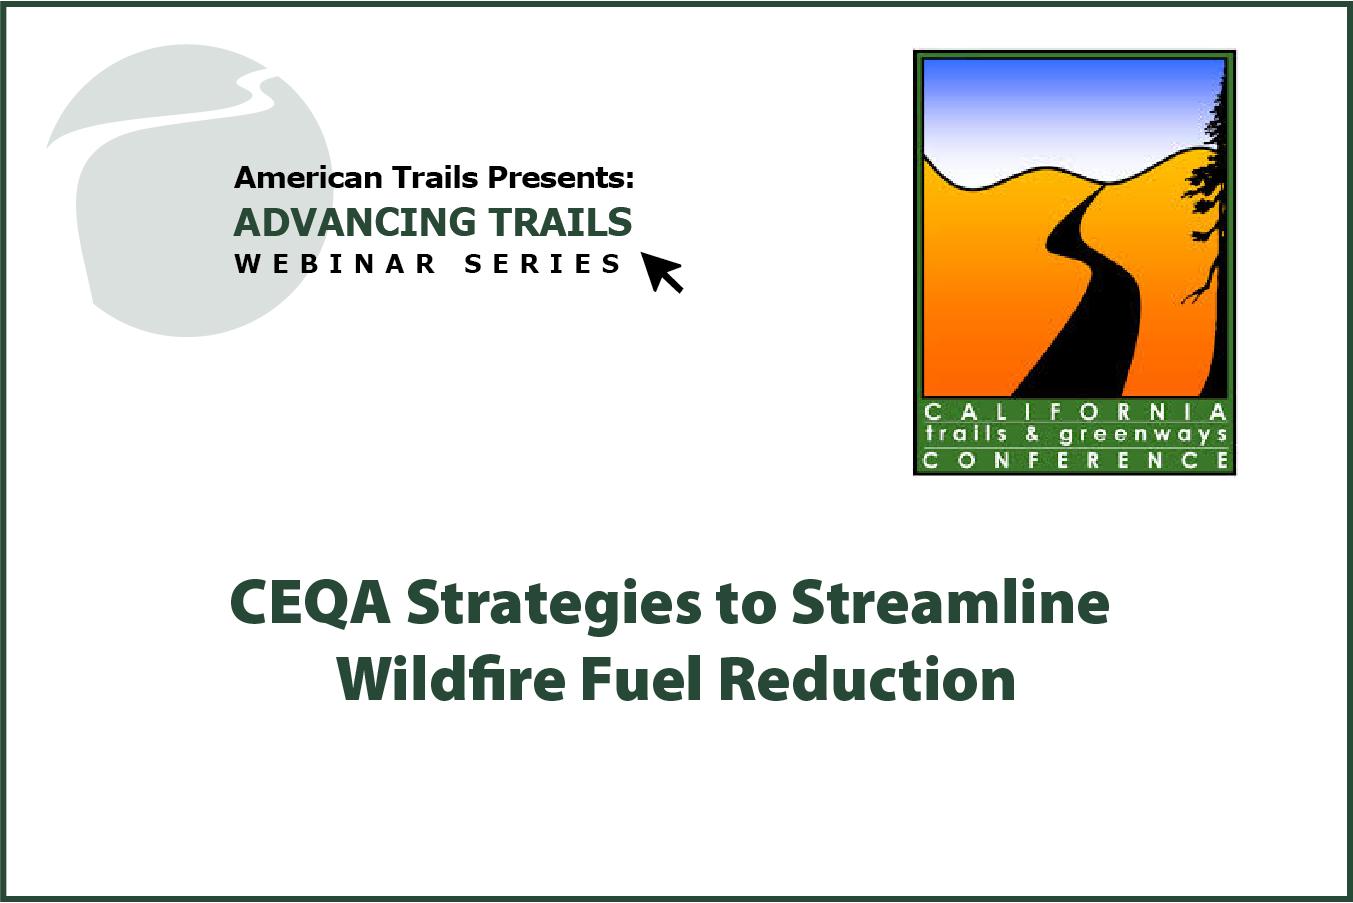 CEQA Strategies to Streamline Wildfire Fuel Reduction (RECORDING)